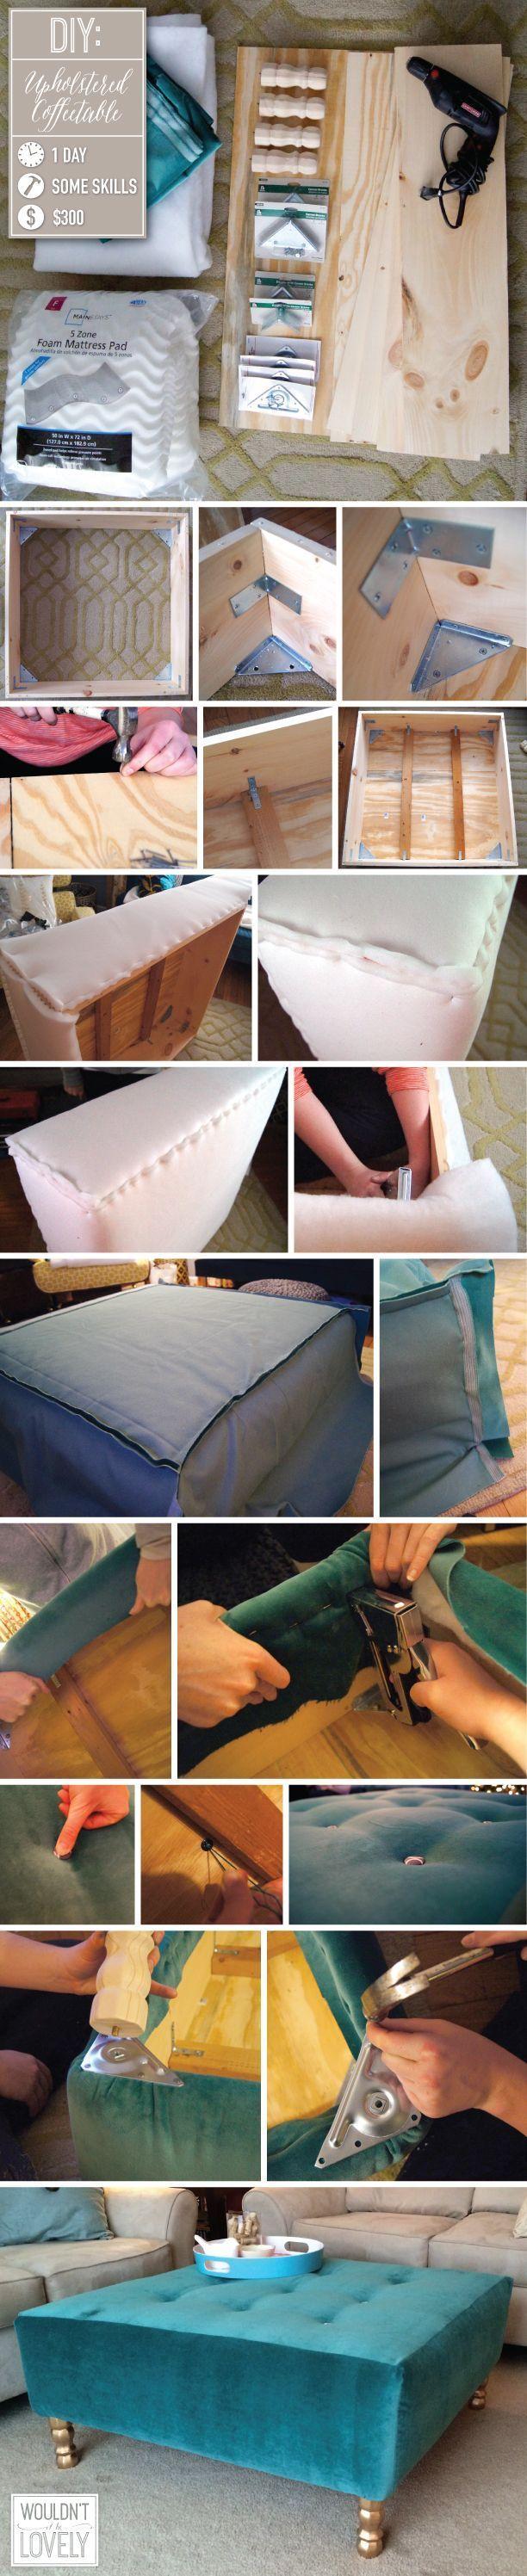 pin von iveta marinova auf handmade pinterest. Black Bedroom Furniture Sets. Home Design Ideas